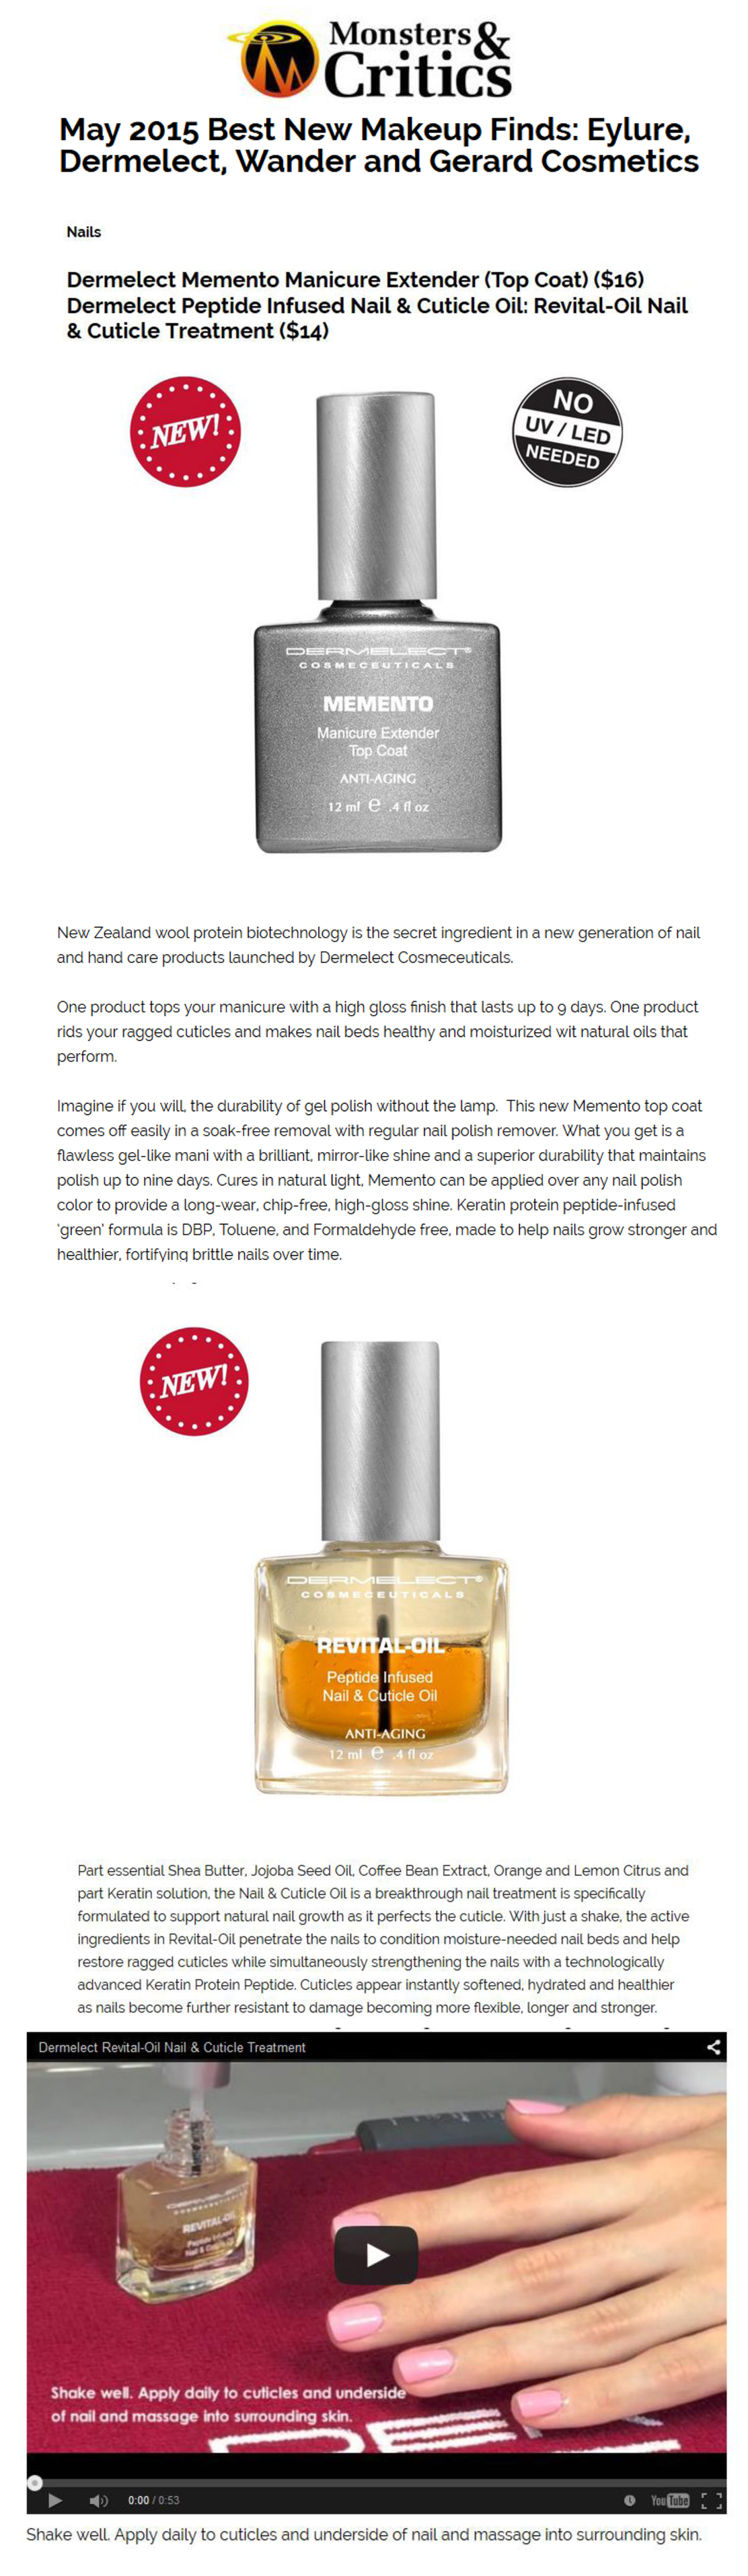 May 2015 Best New Makeup Finds: Dermelect Memento Manicure Extender ...